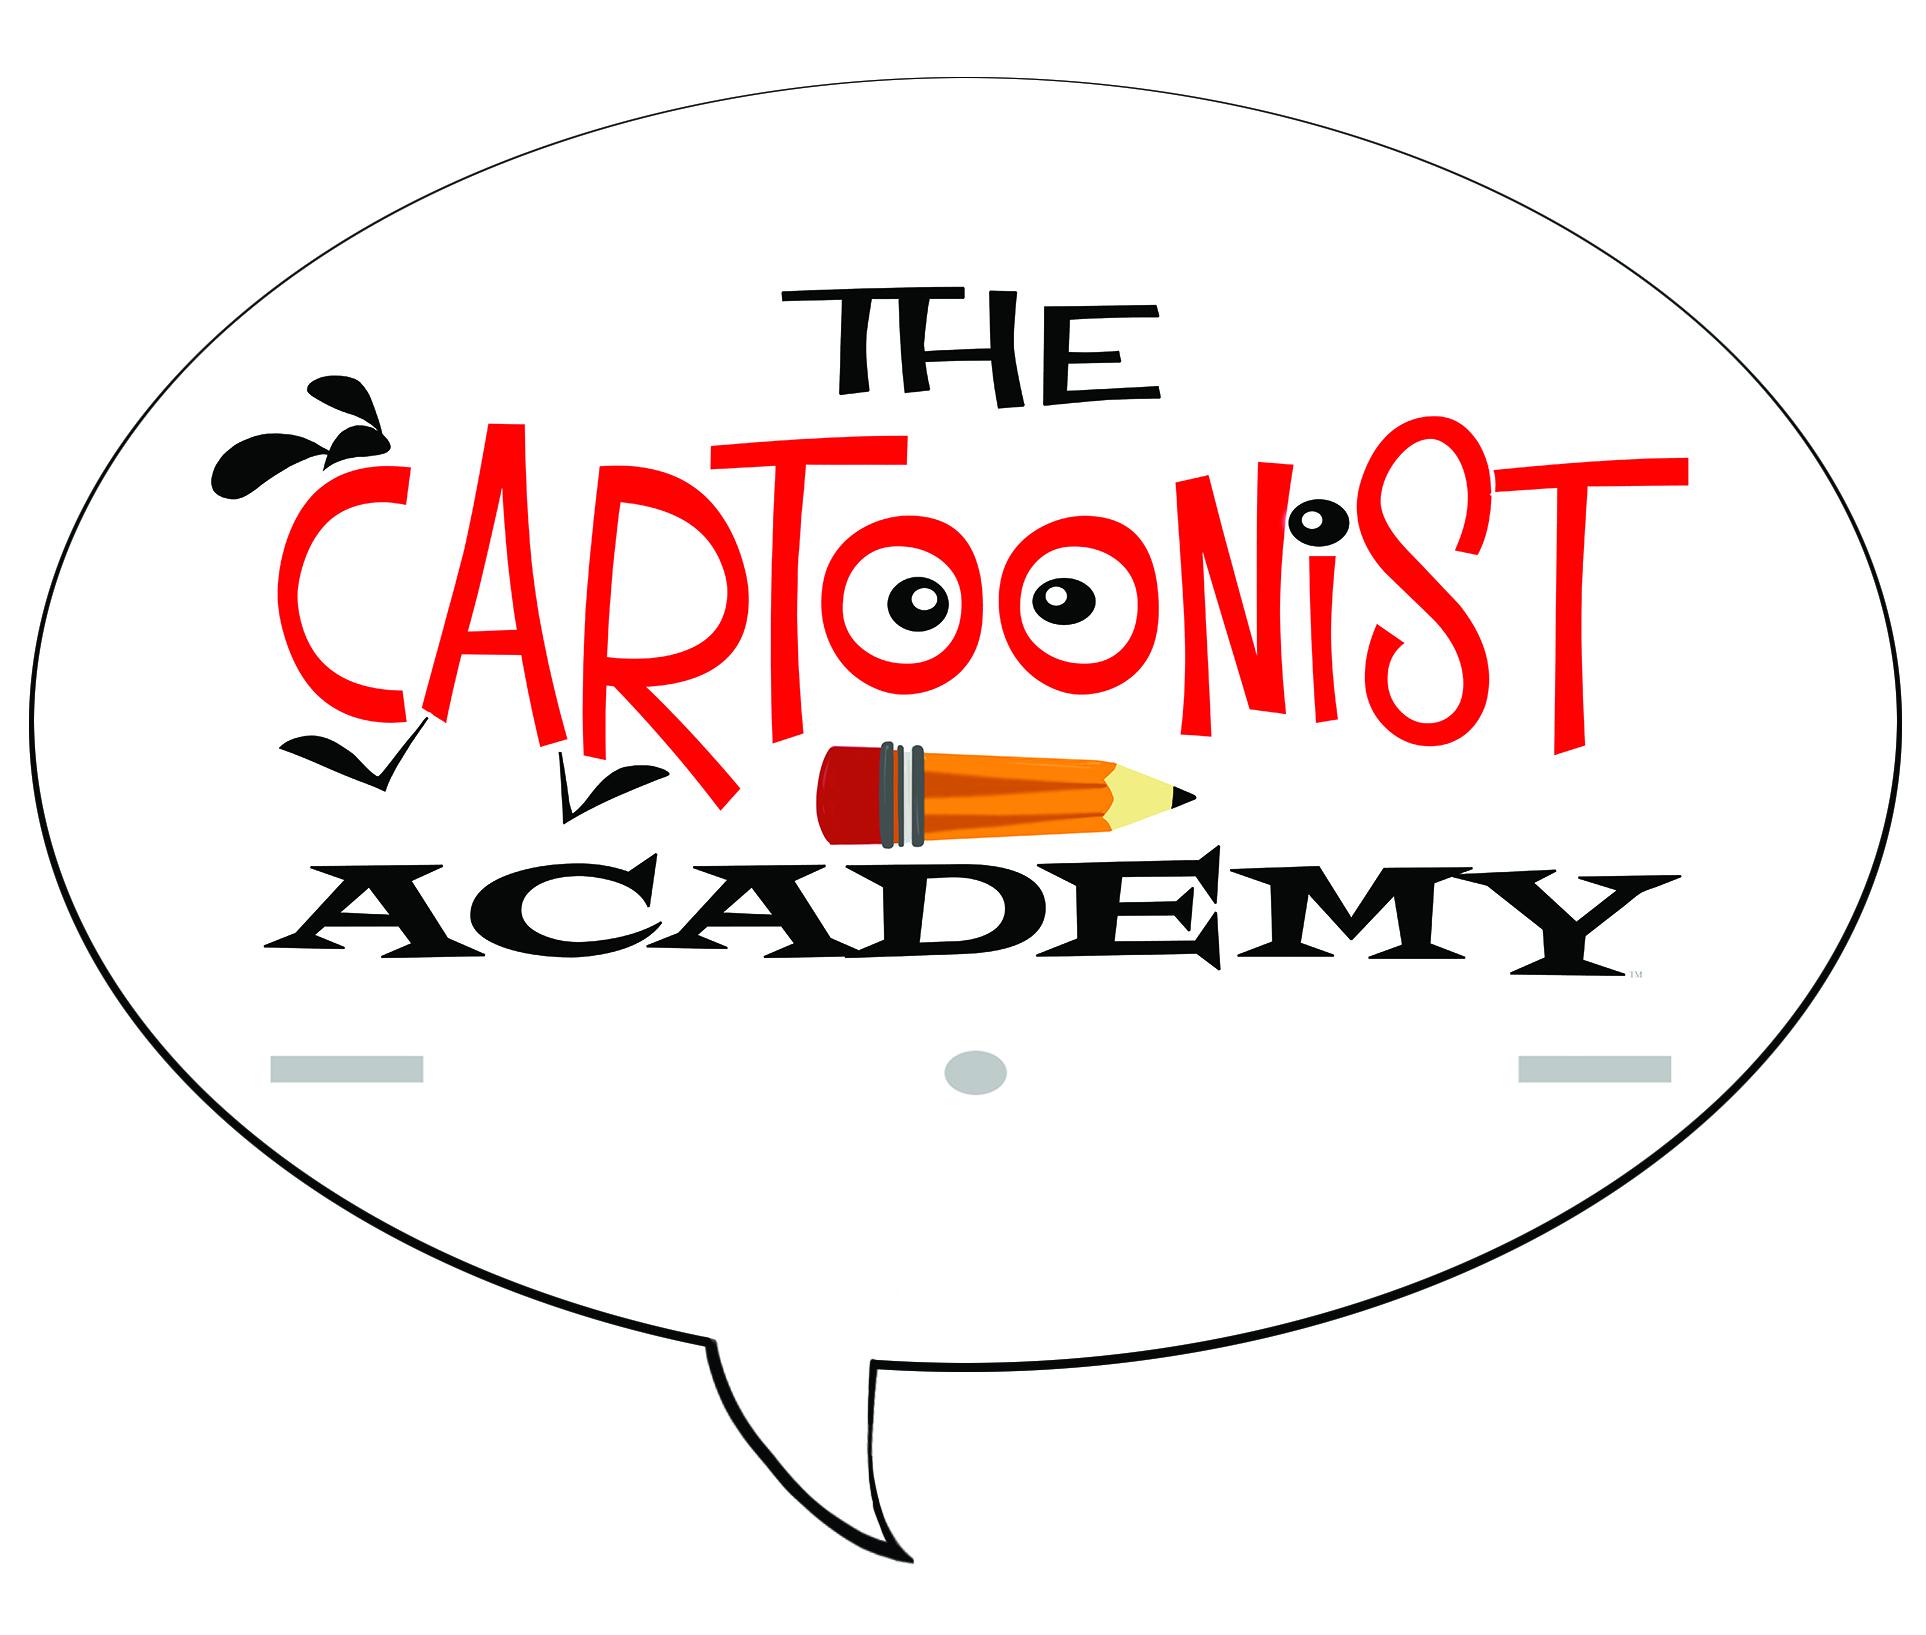 TheCartoonistAcademyLOGO